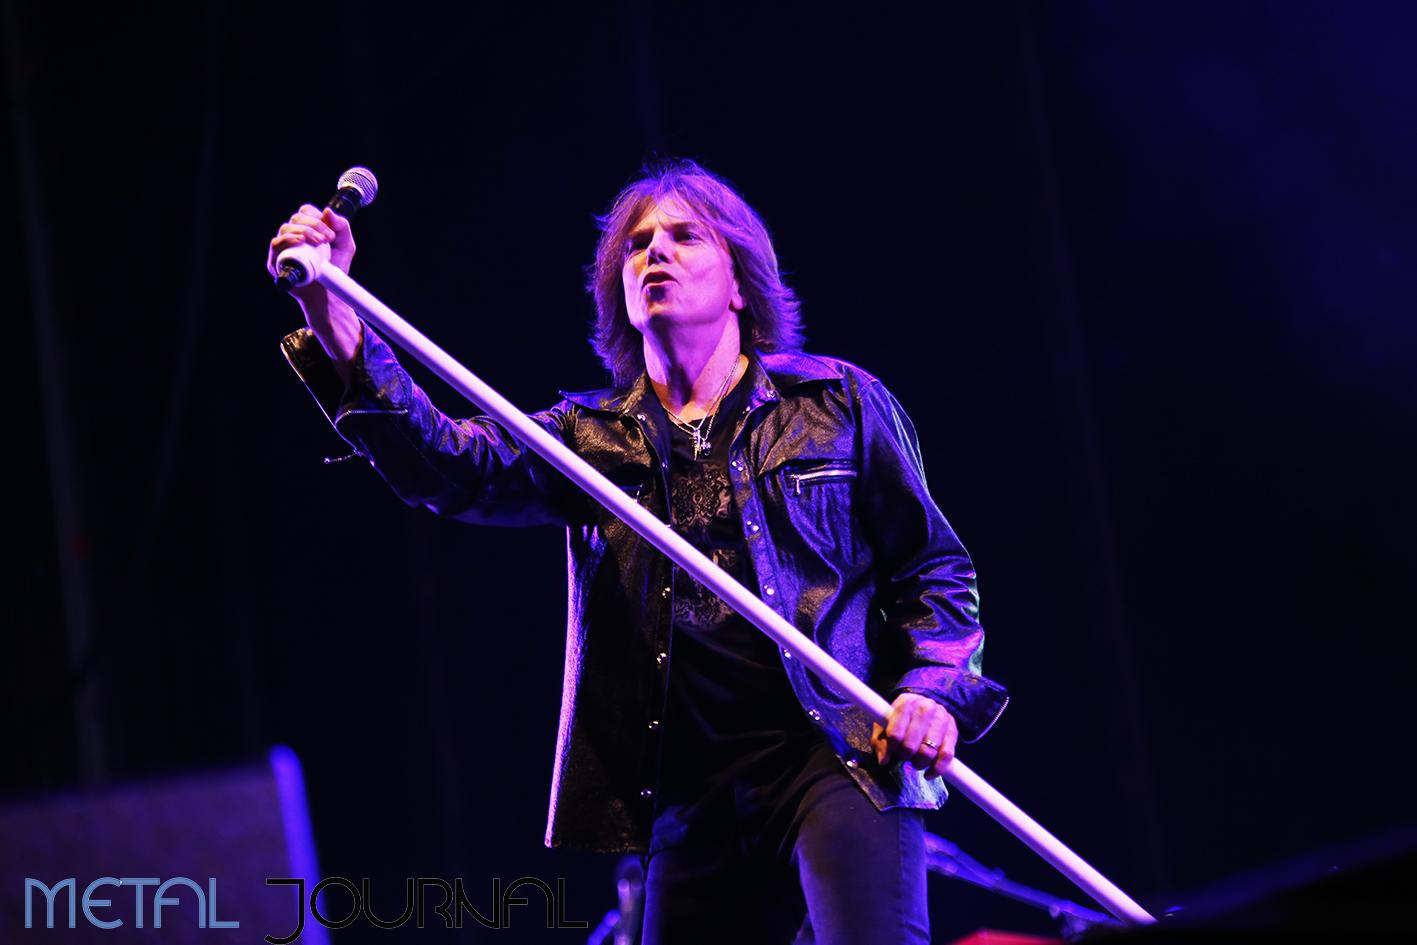 europe - metal journal rock fest barcelona 2019 pic 2